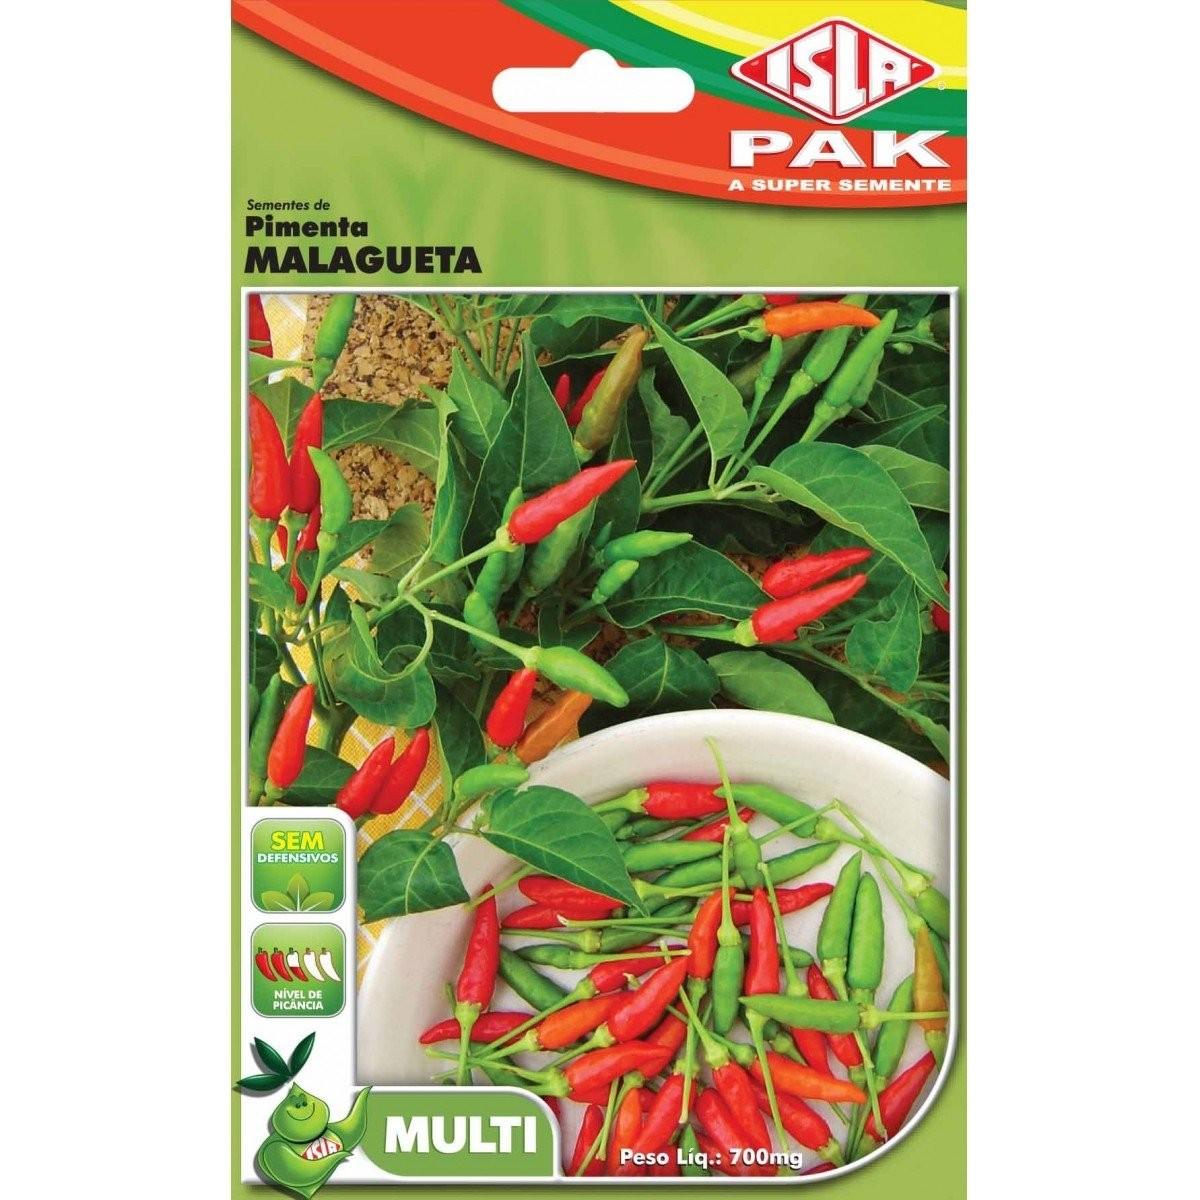 Sementes de Pimenta Malagueta